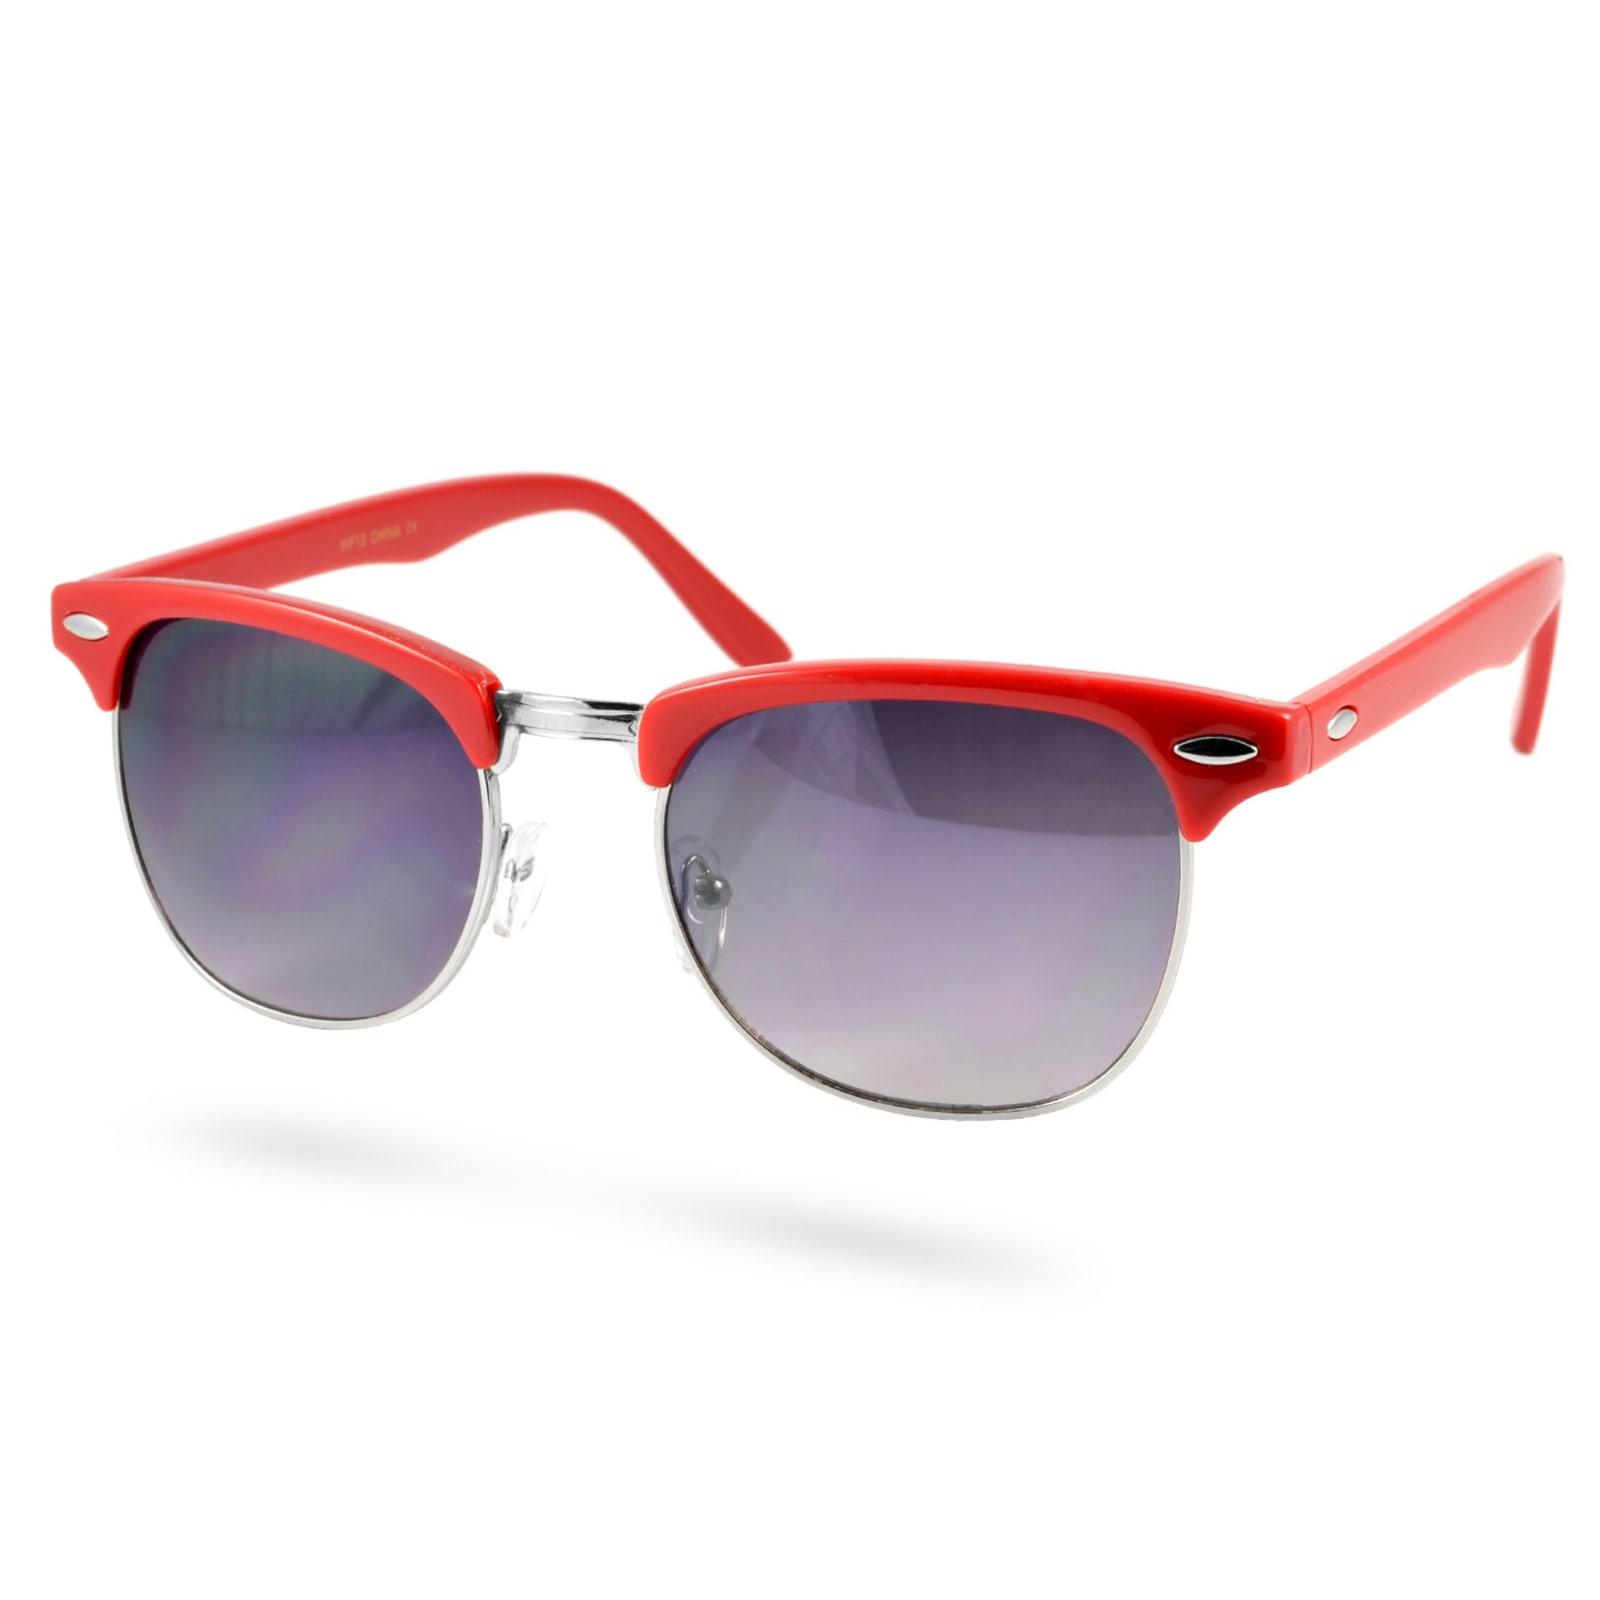 411ba1ad857 Κόκκινα Vintage Γυαλιά Ηλίου LA   Σε απόθεμα!   EverShade